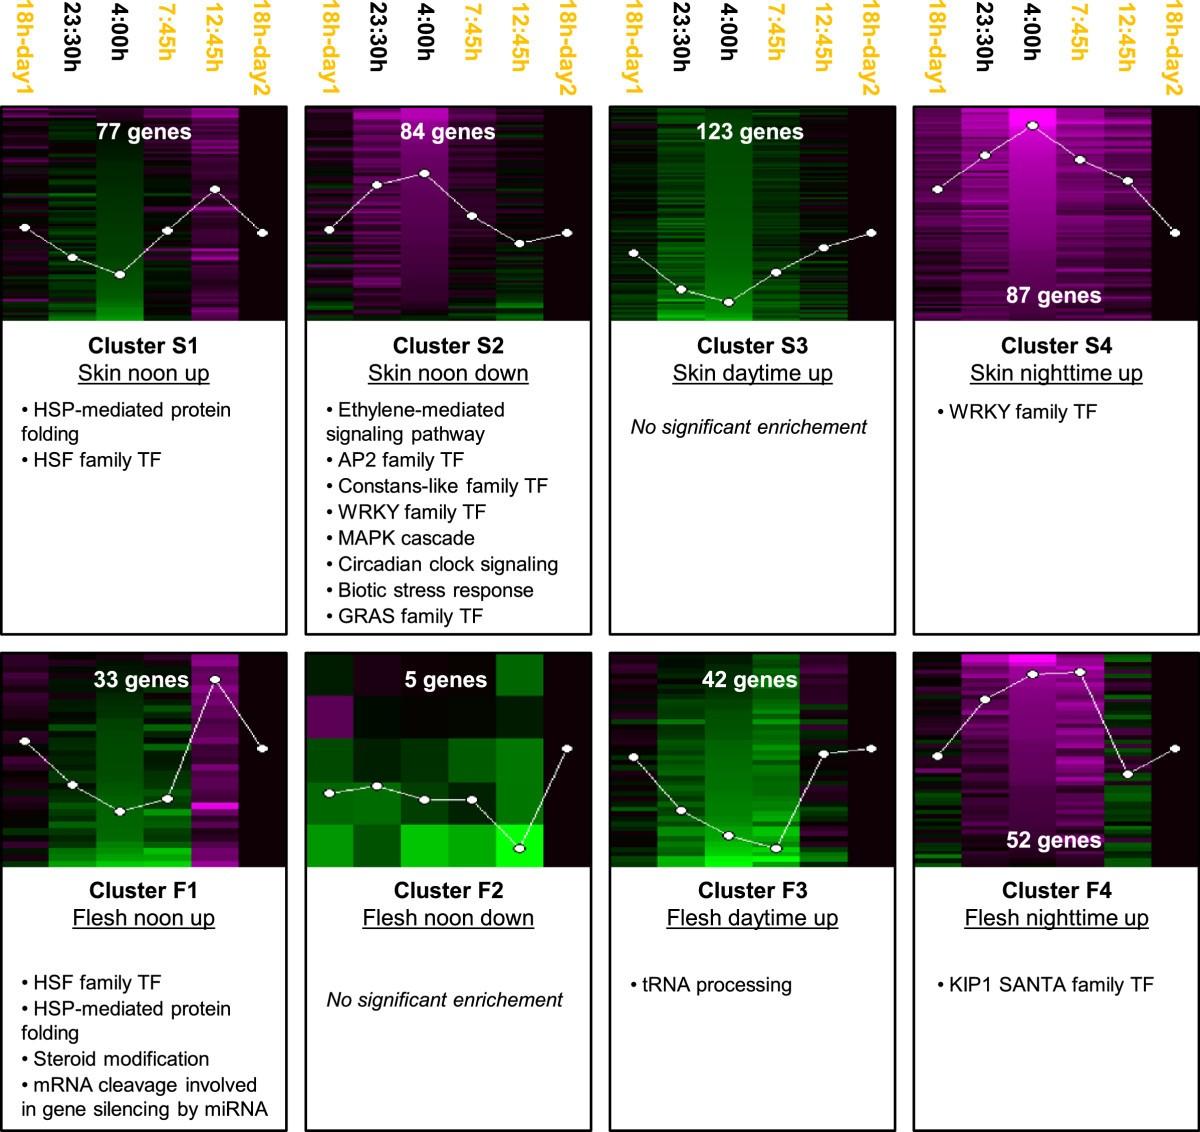 Circadian Oscillatory Transcriptional Programs In Grapevine Ripening Free Pcb Design Software Freepcb V1355 Figure 2